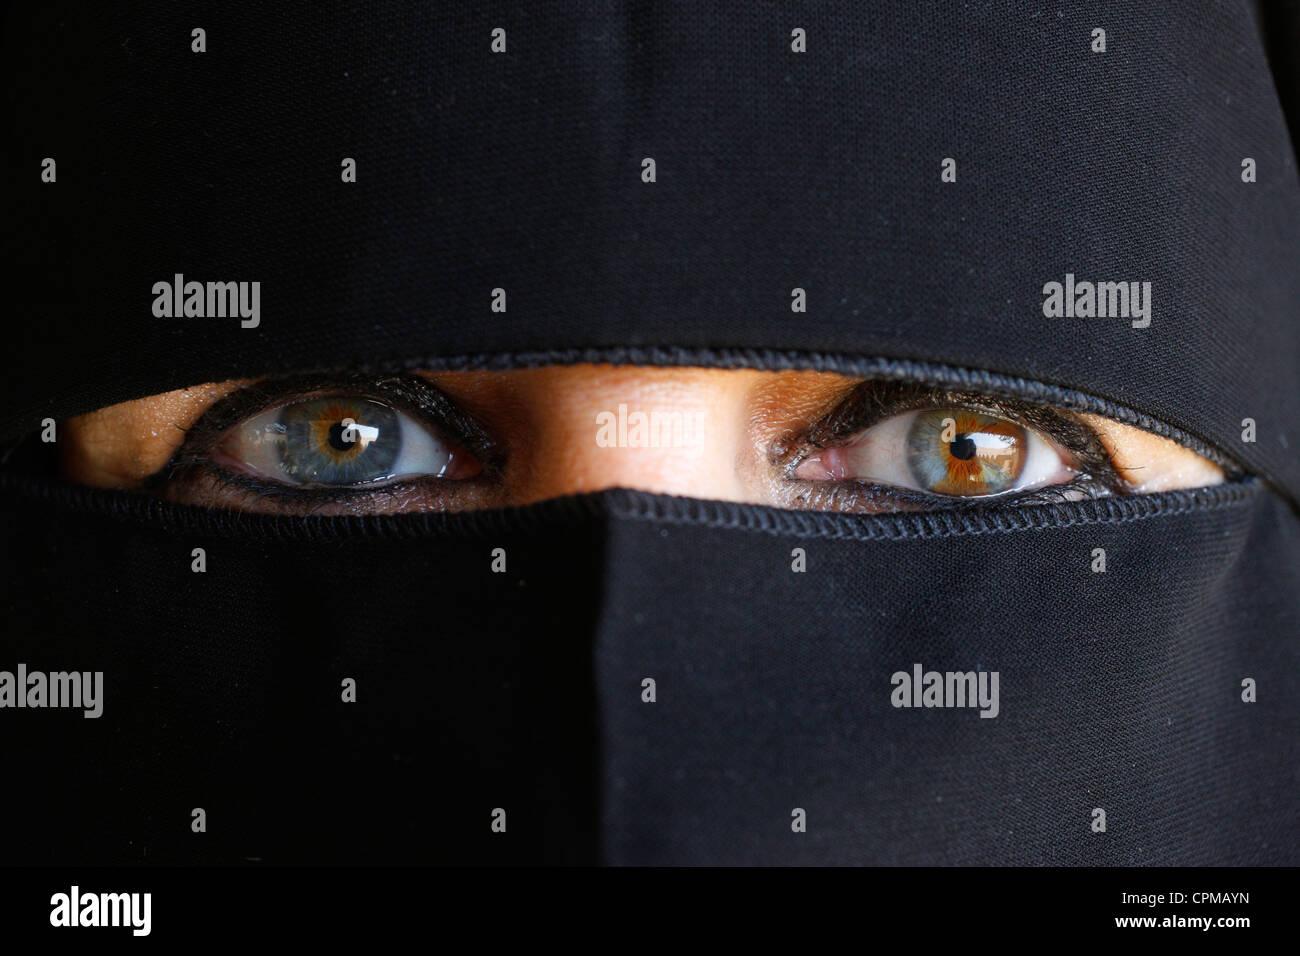 Recherche femme musulmane